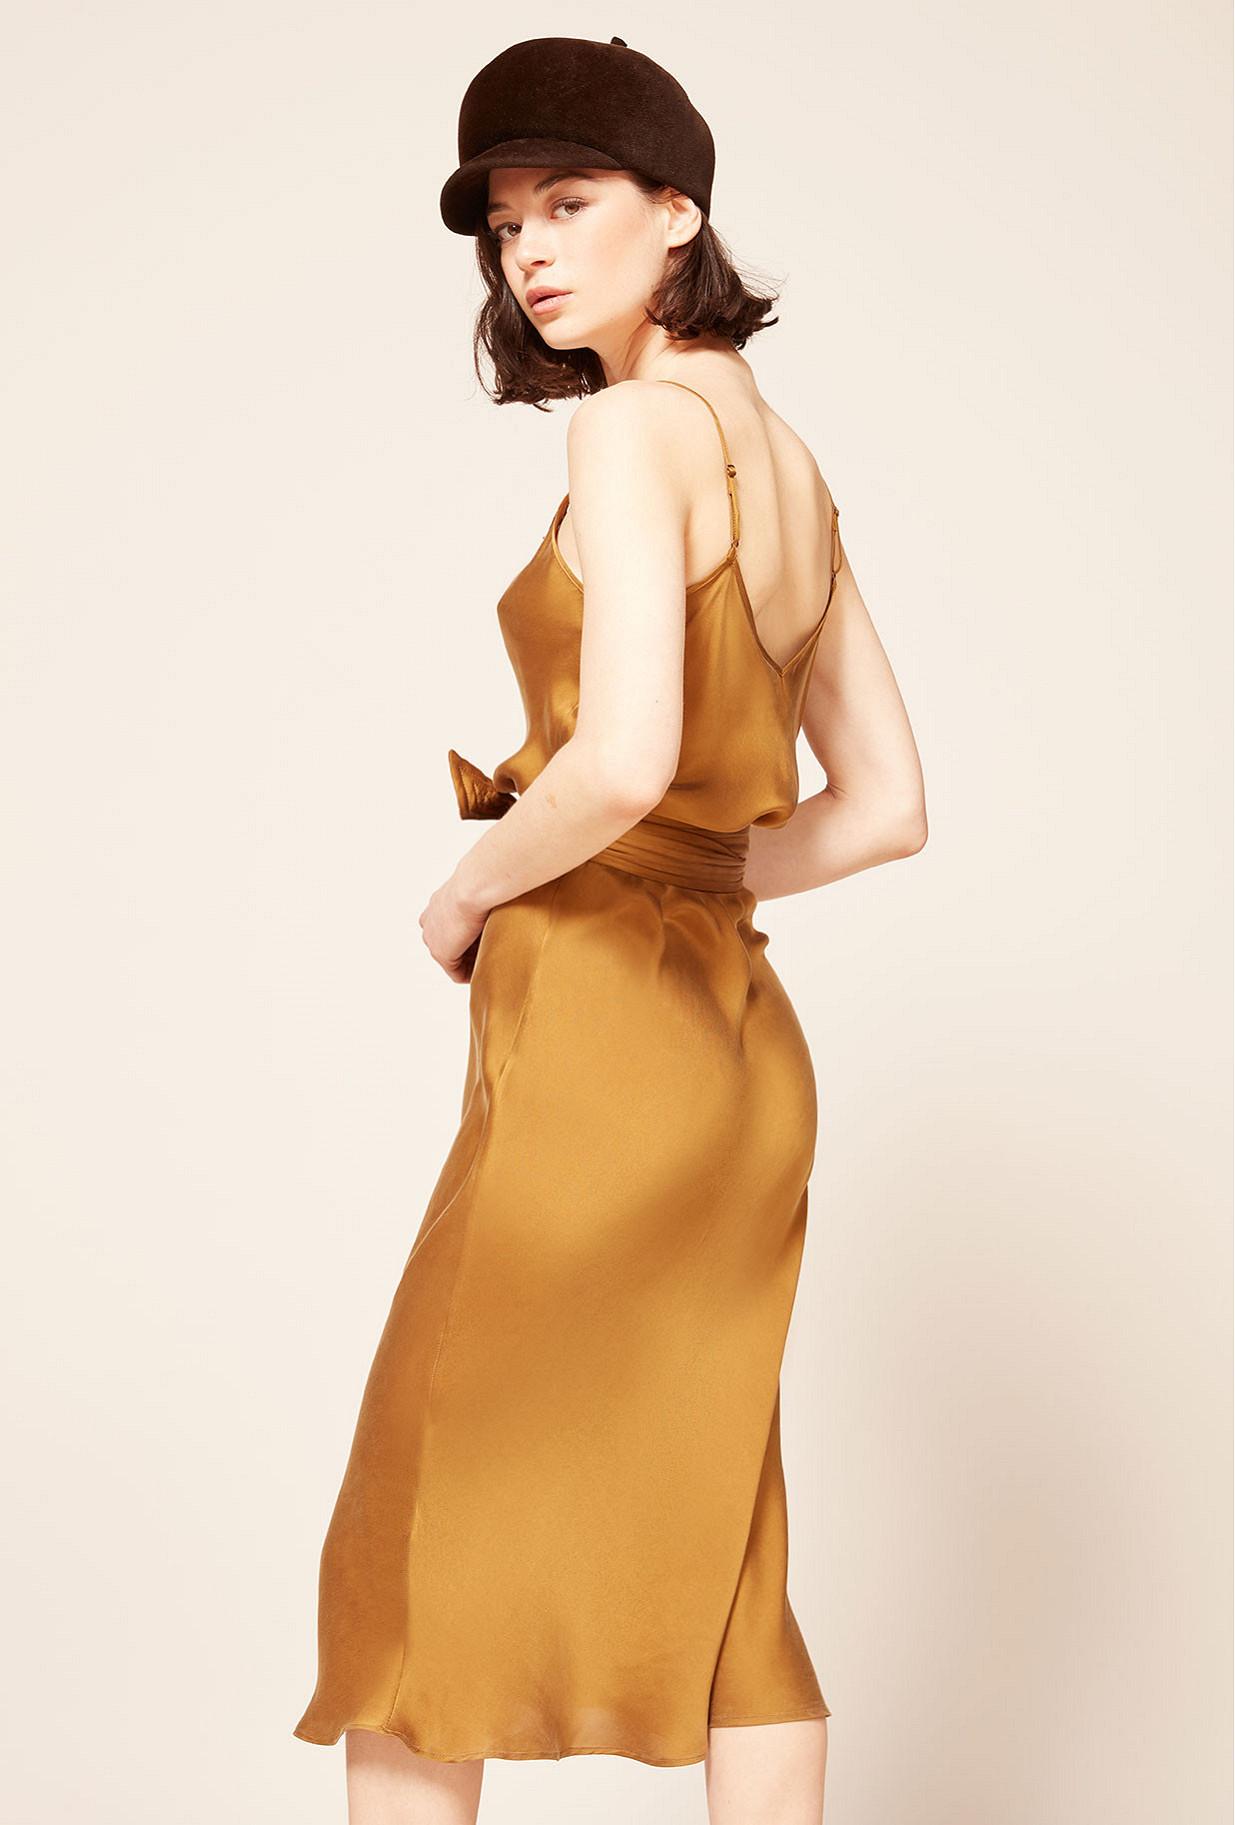 Paris clothes store Dress  Ana french designer fashion Paris